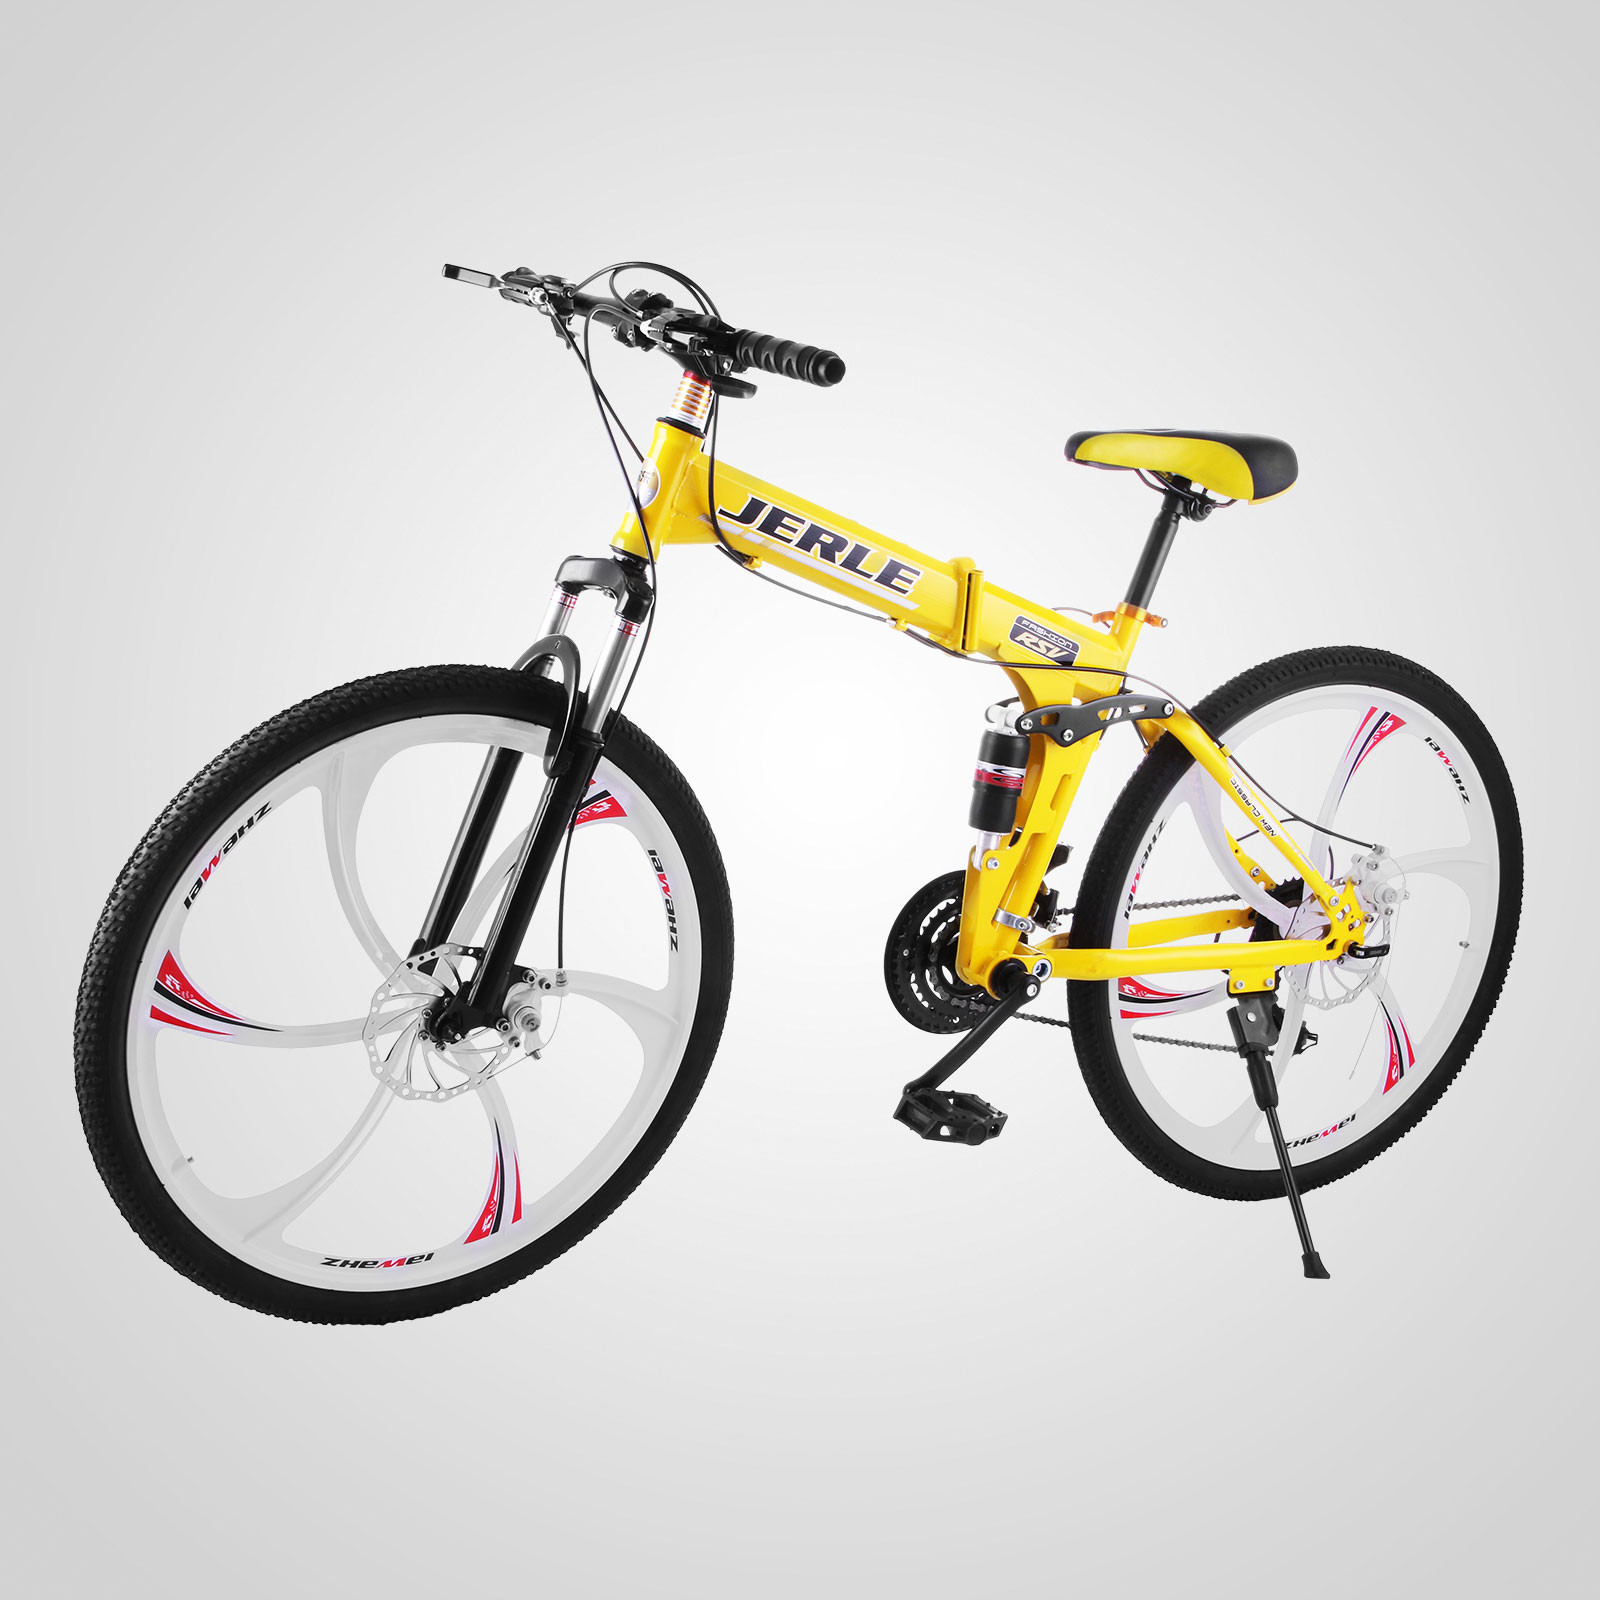 26 pollici bicicletta 21 marce 6 sostituto red high. Black Bedroom Furniture Sets. Home Design Ideas